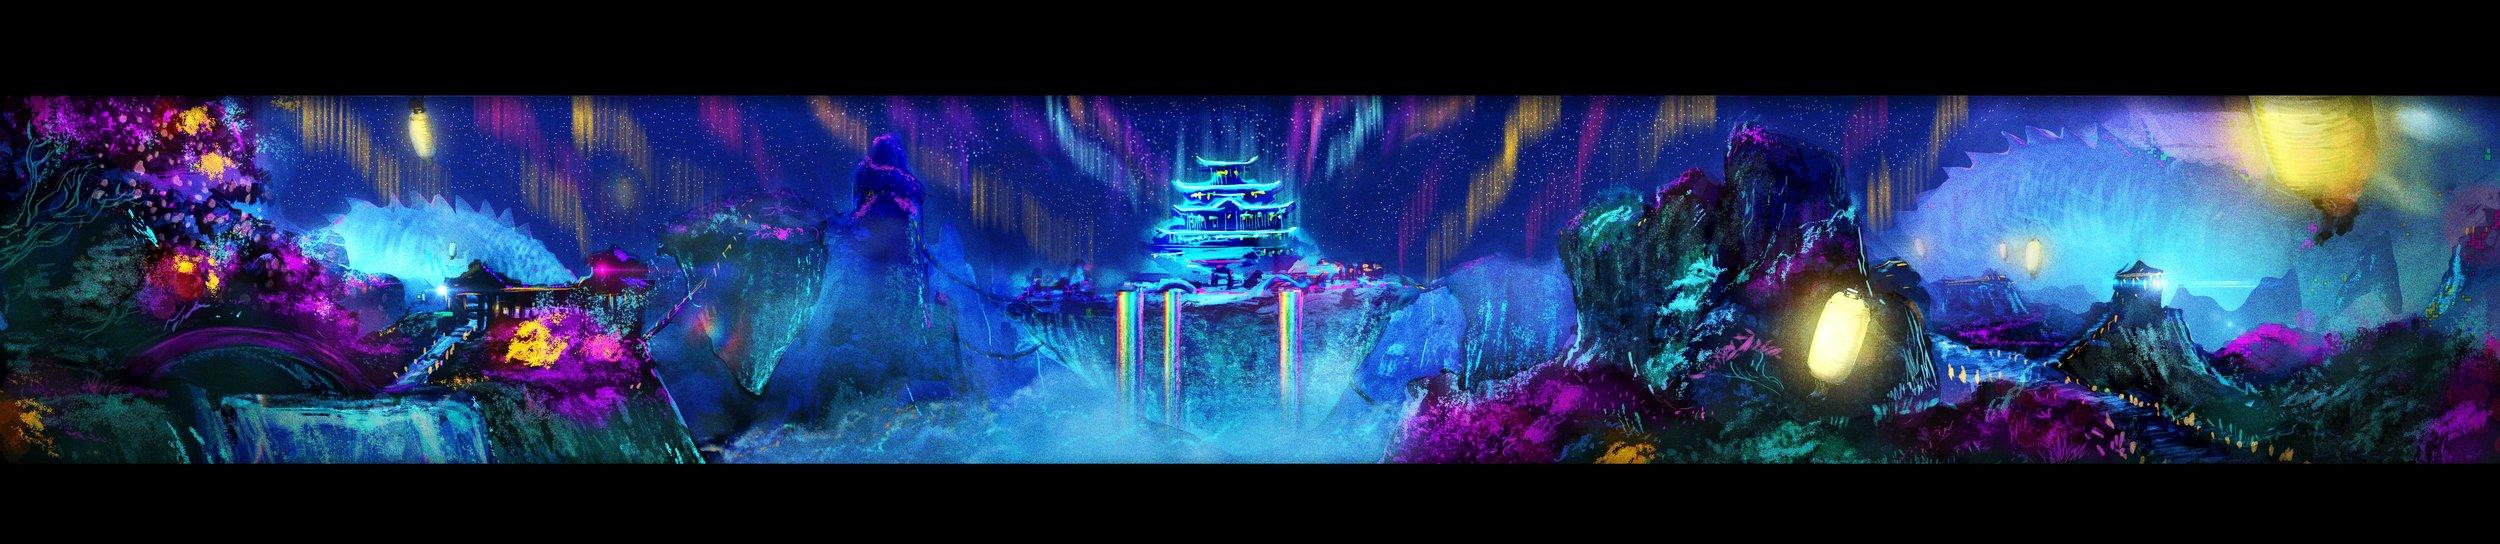 Fantasia Overview-Sketch_NEON.jpg